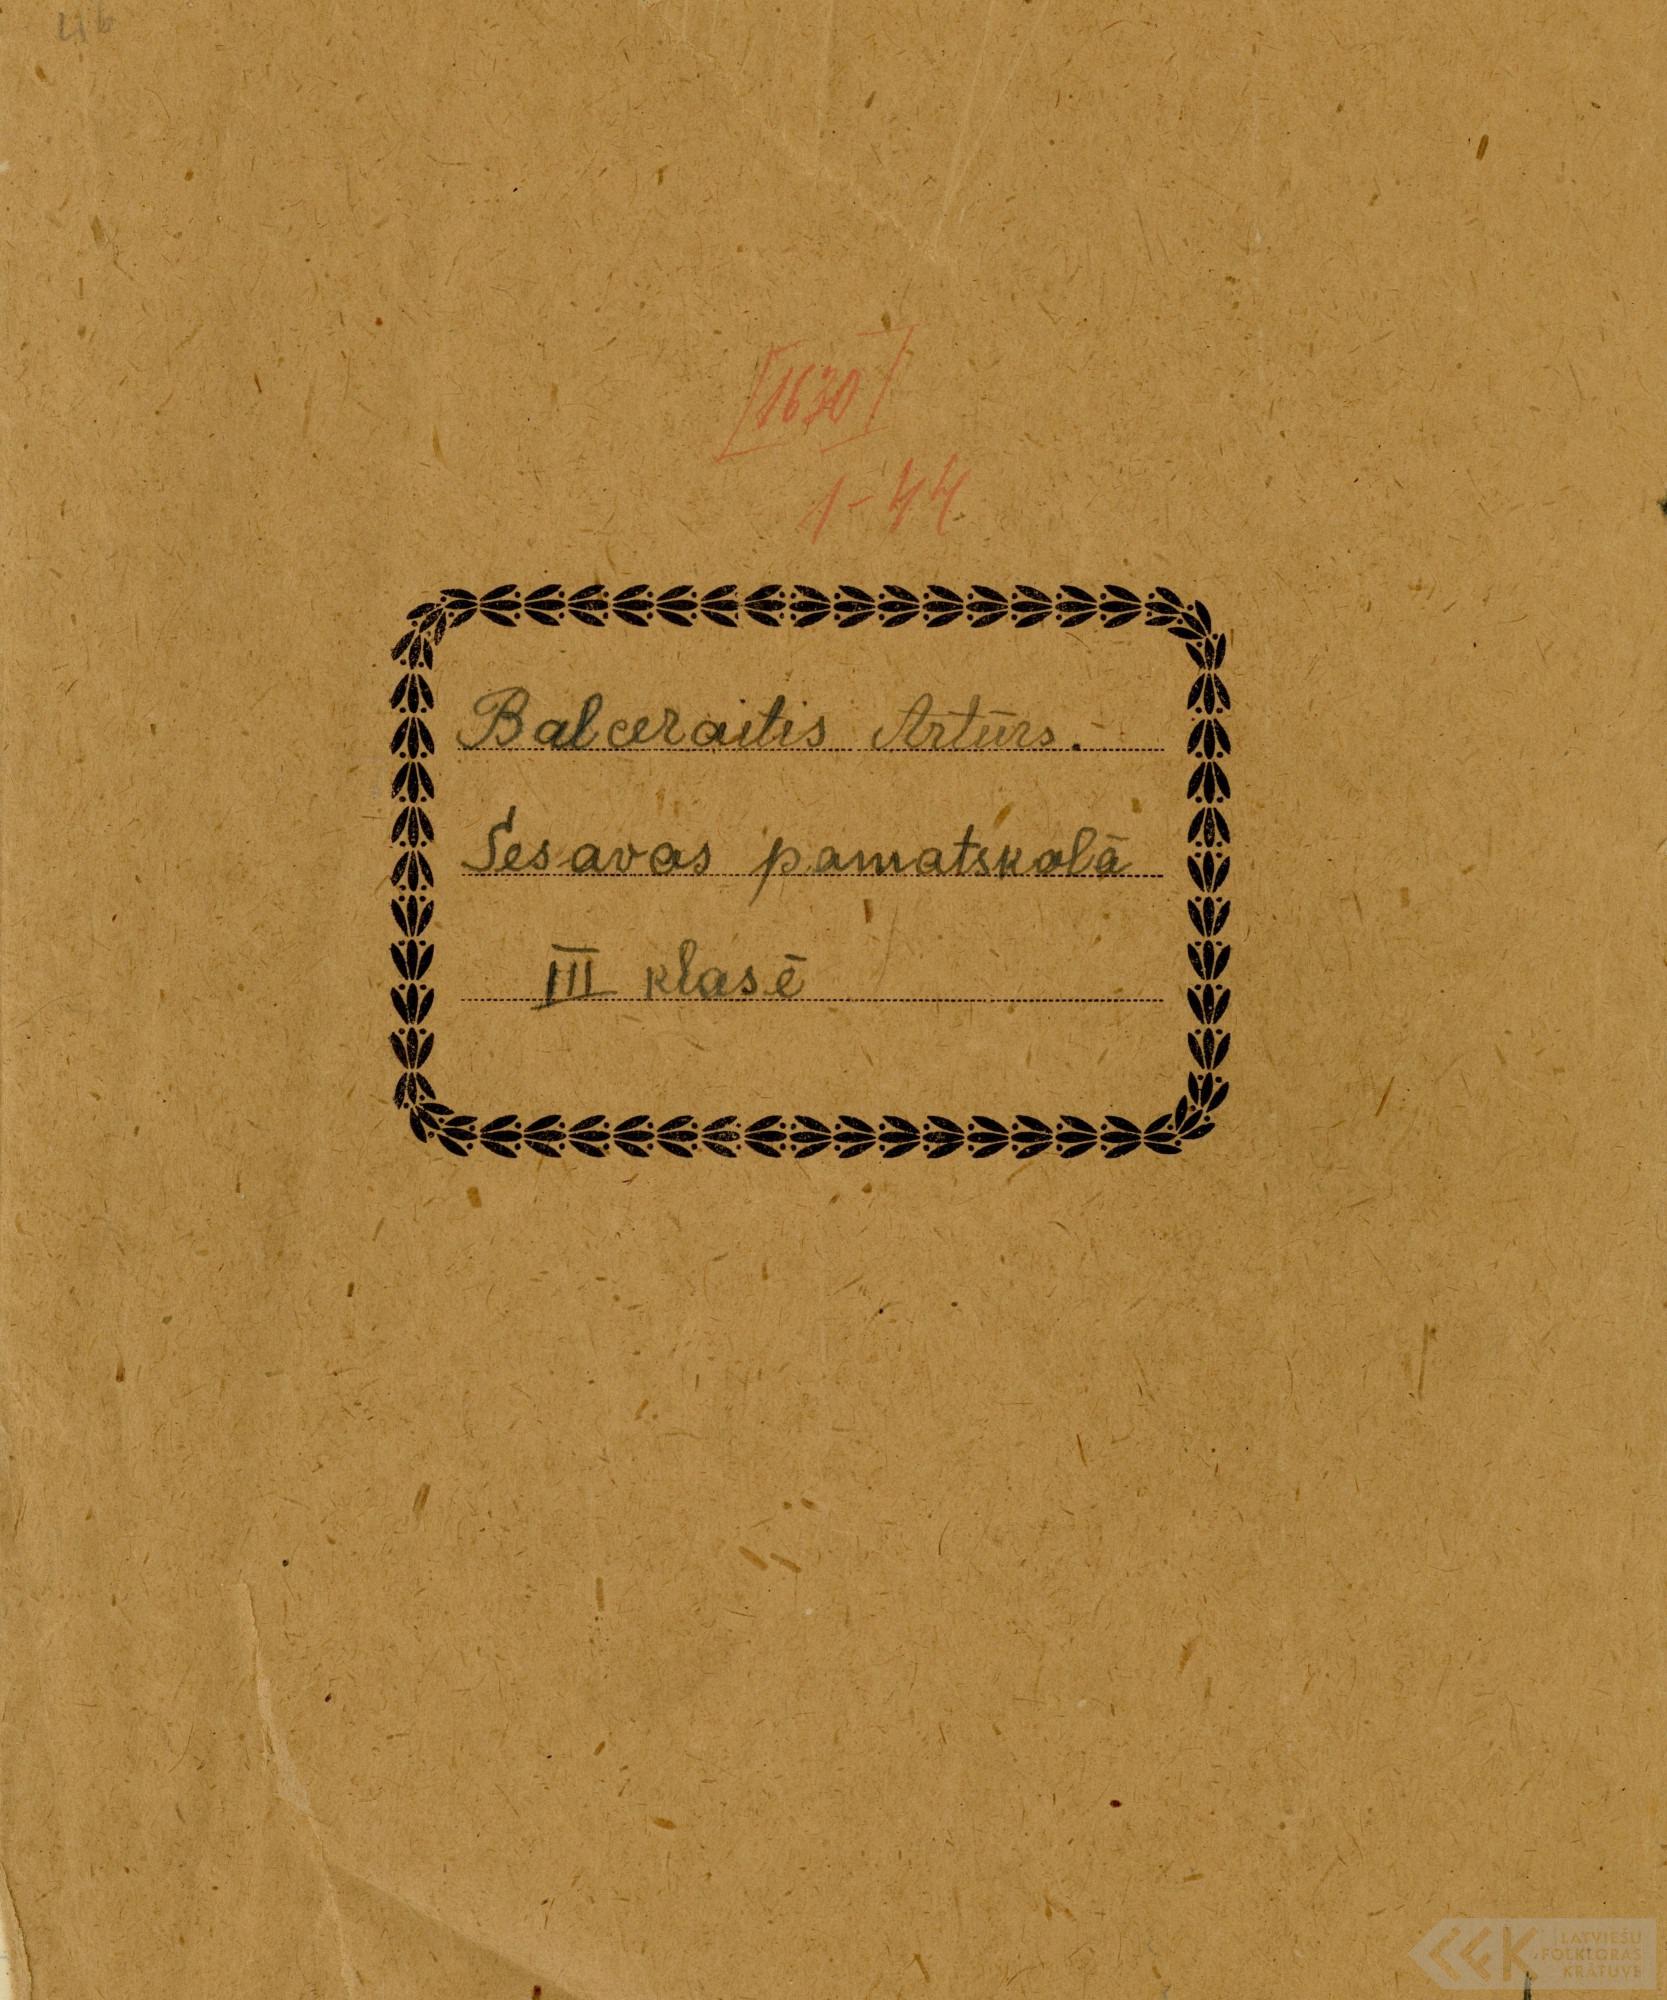 1630-Sesavas-pamatskola-01-0001